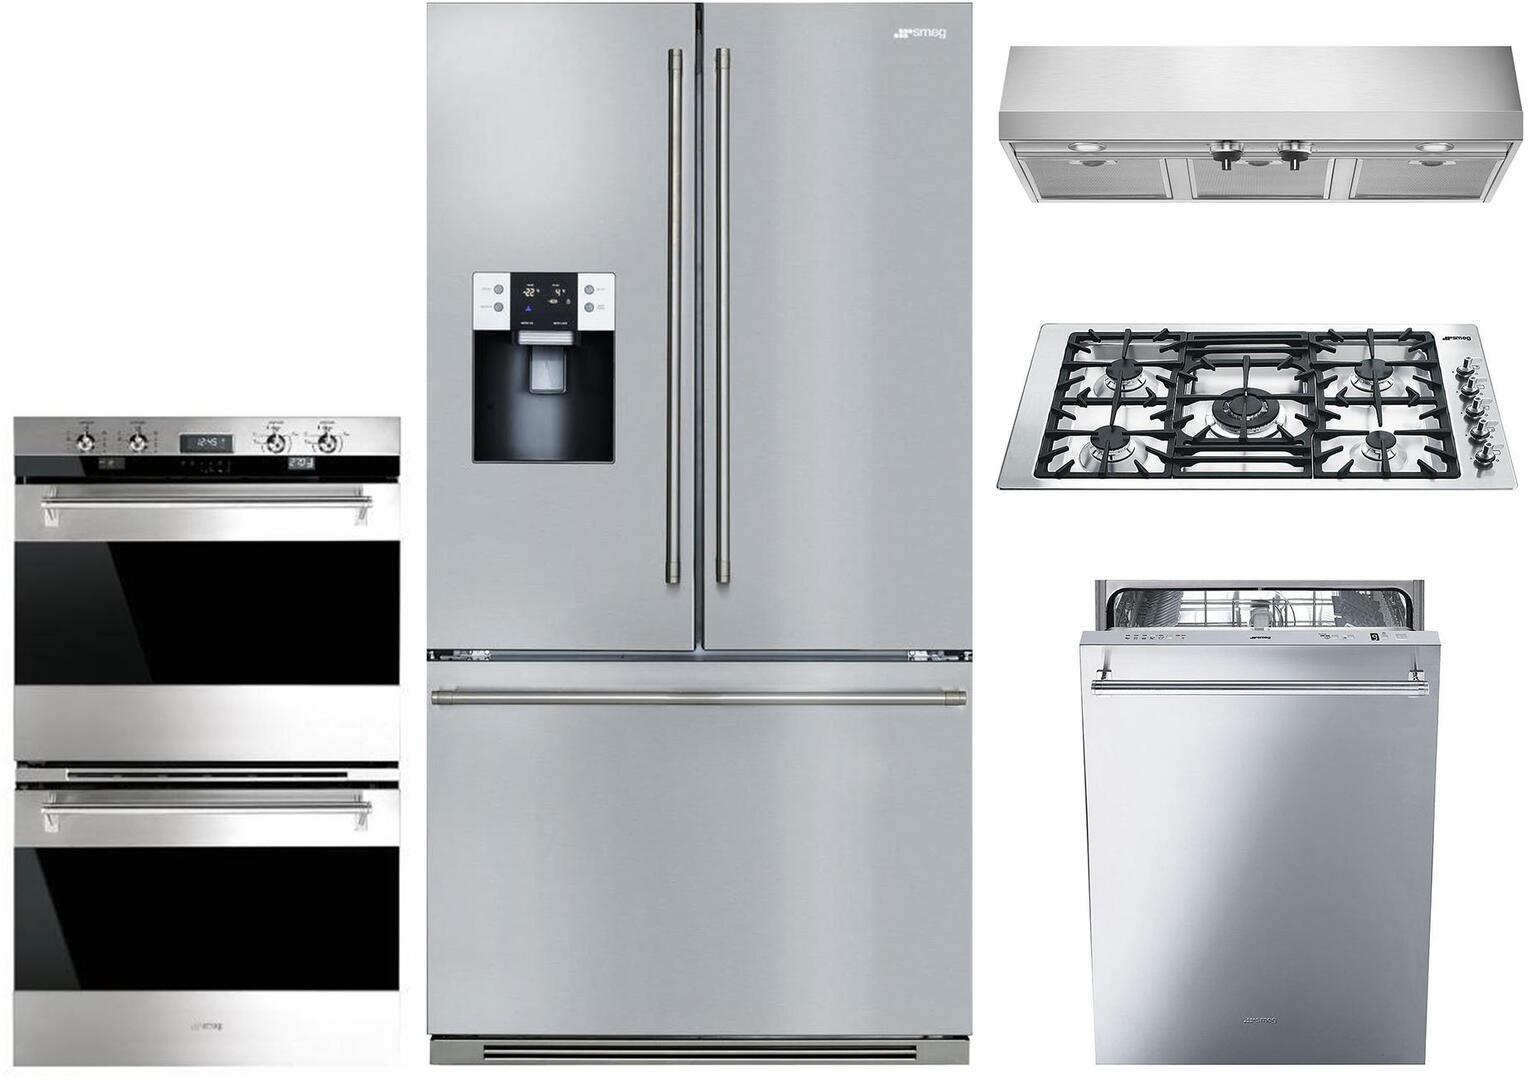 Smeg 1054388 5 piece Stainless Steel Kitchen Appliances Package